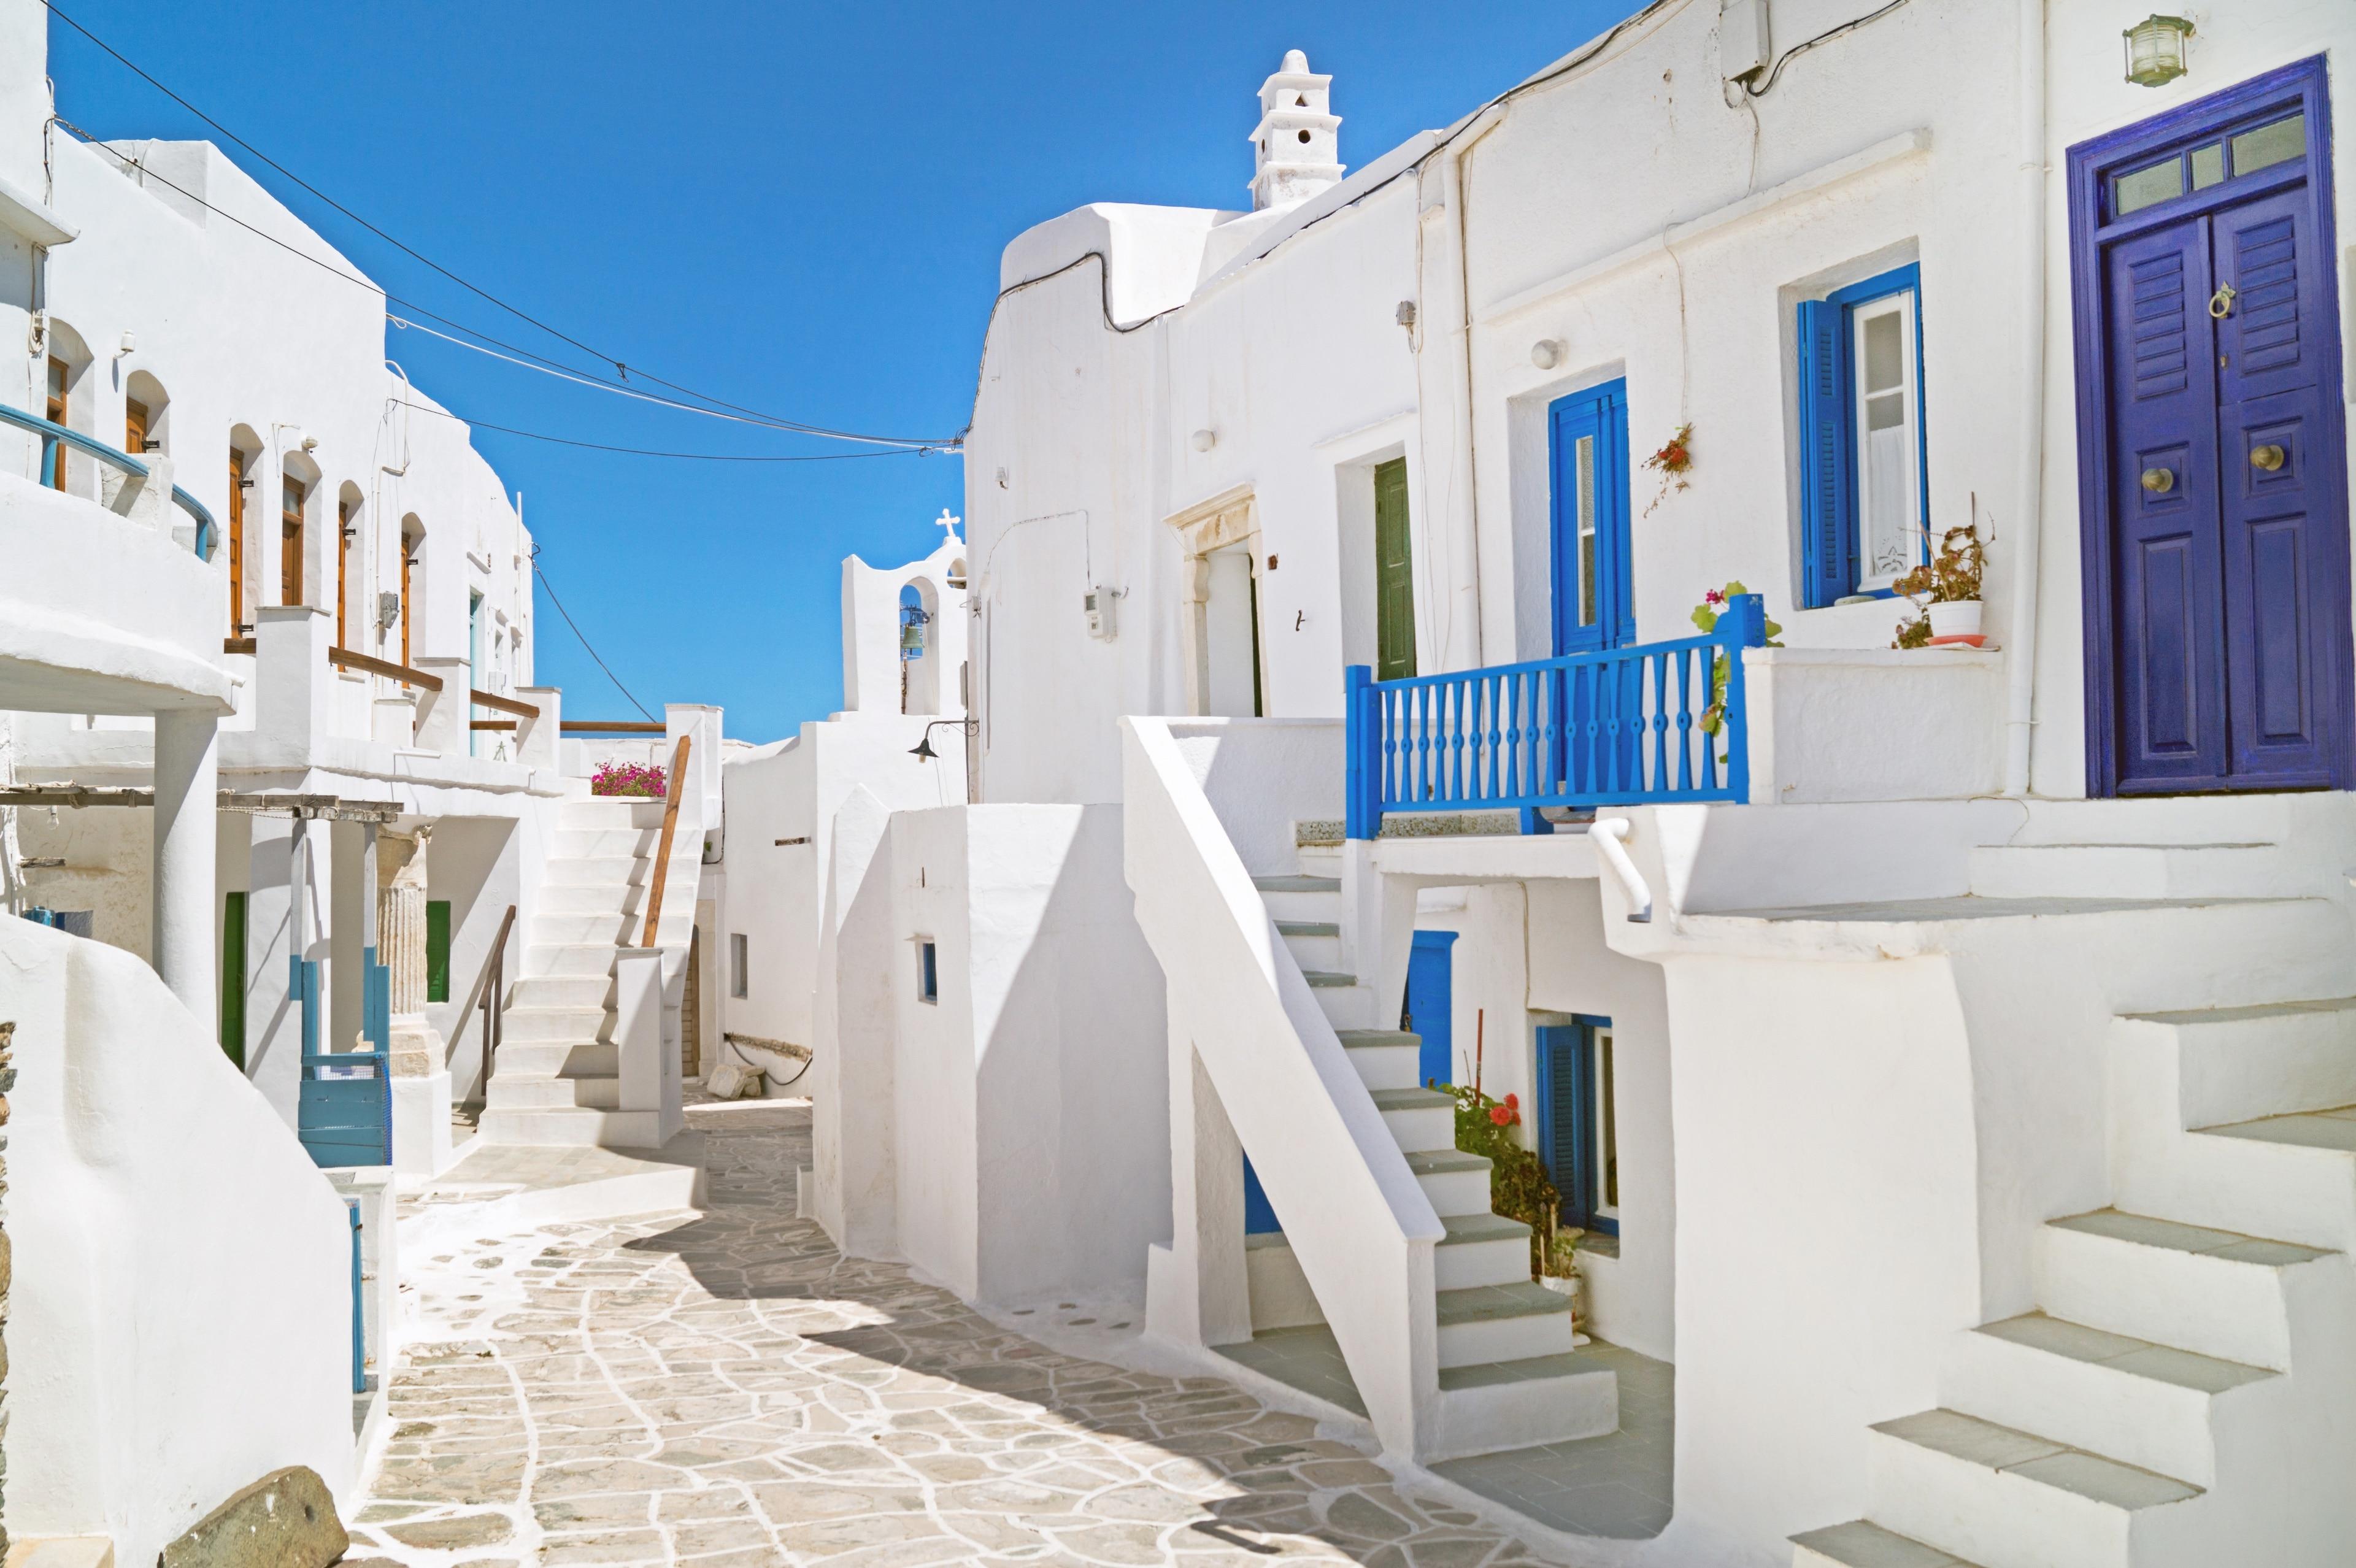 Sifnos, South Aegean, Greece